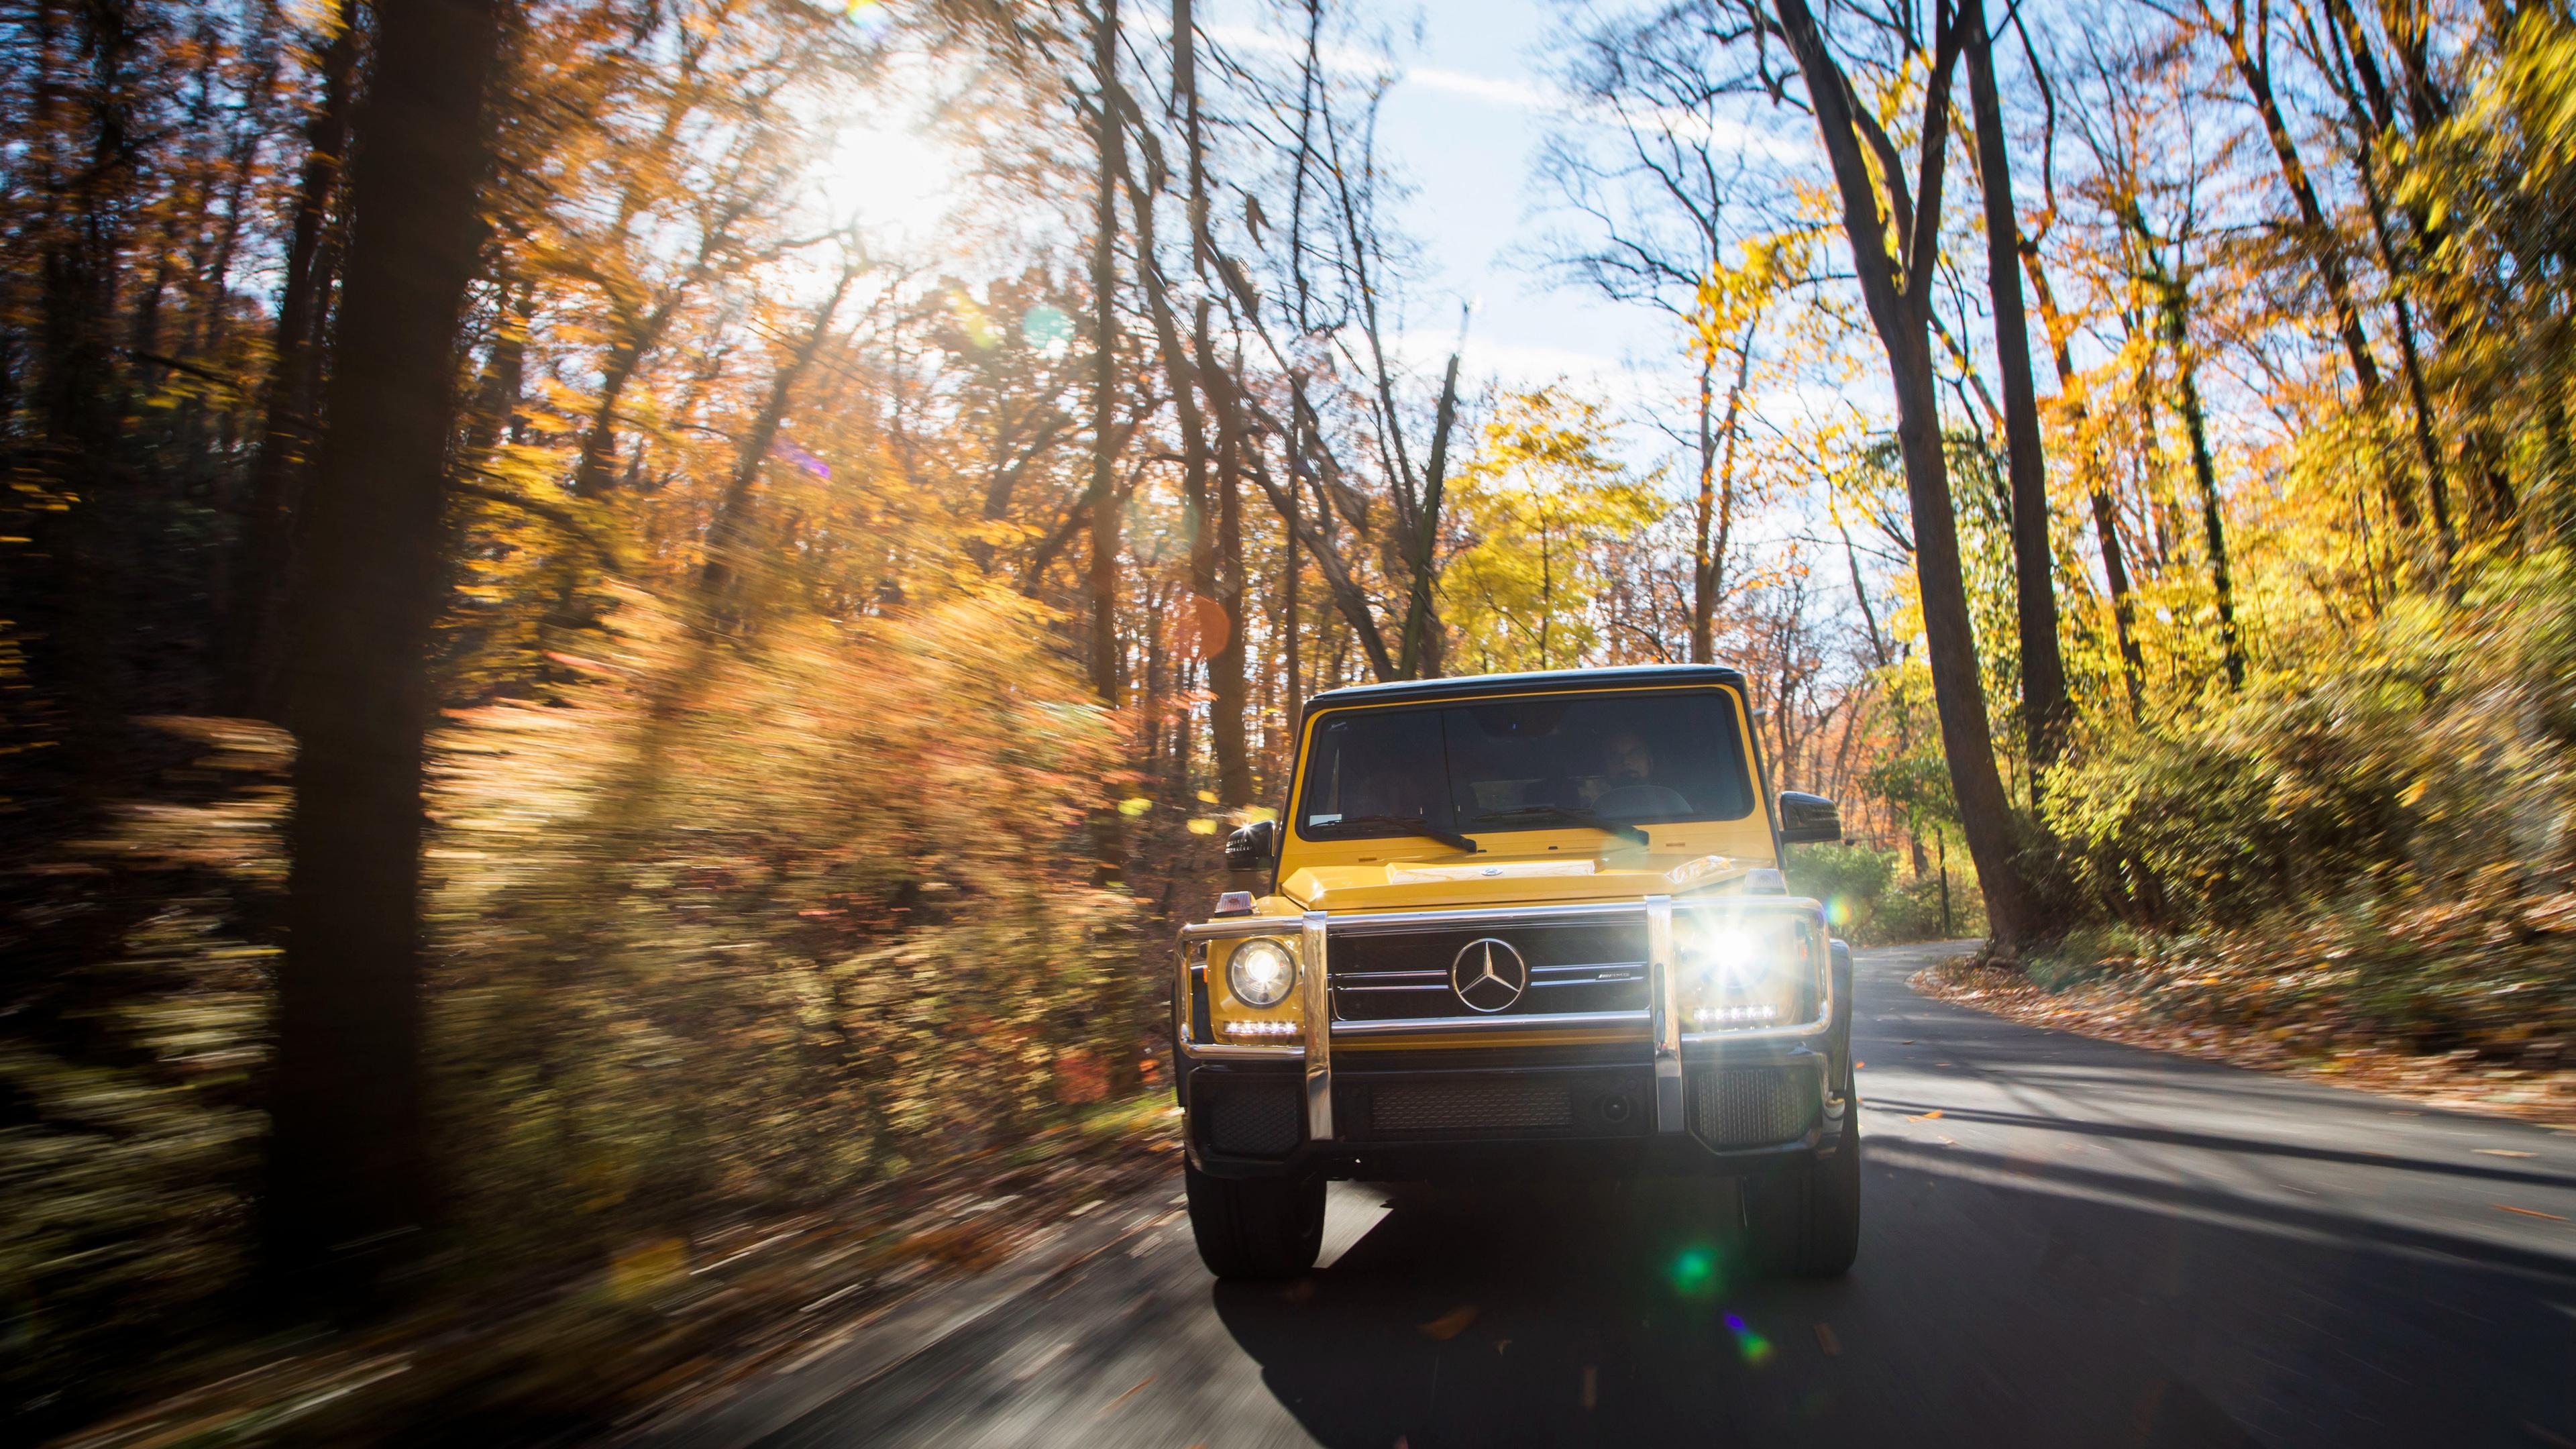 2017 mercedes amg g63 yellow 4k 1539108786 - 2017 Mercedes AMG G63 Yellow 4k - mercedes wallpapers, mercedes g class wallpapers, mercedes benz wallpapers, mercedes amg wallpapers, hd-wallpapers, cars wallpapers, 4k-wallpapers, 2017 cars wallpapers